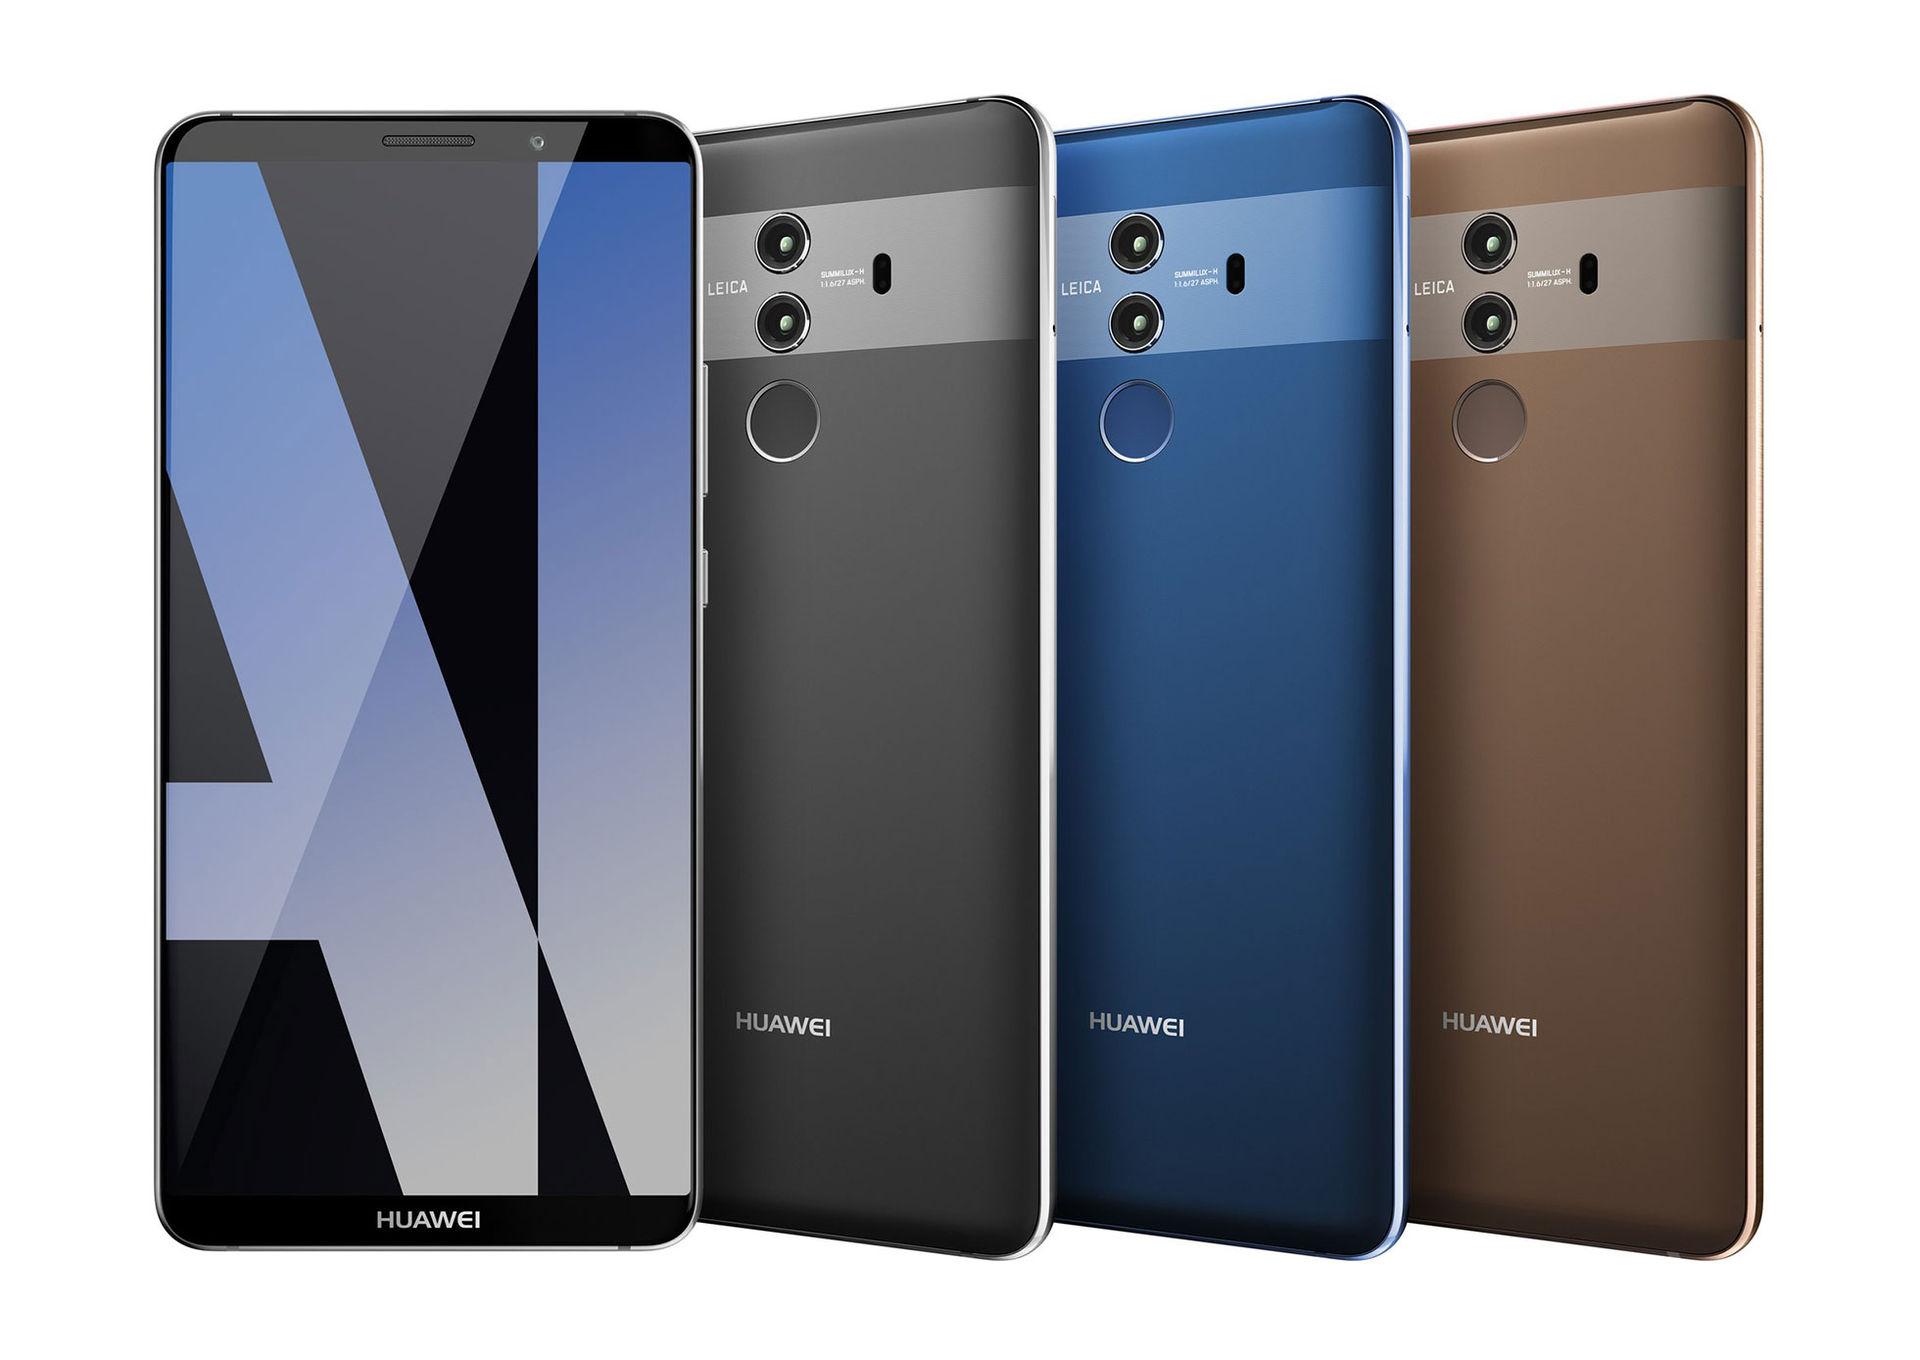 Huawei Mate 10 Pro läcker